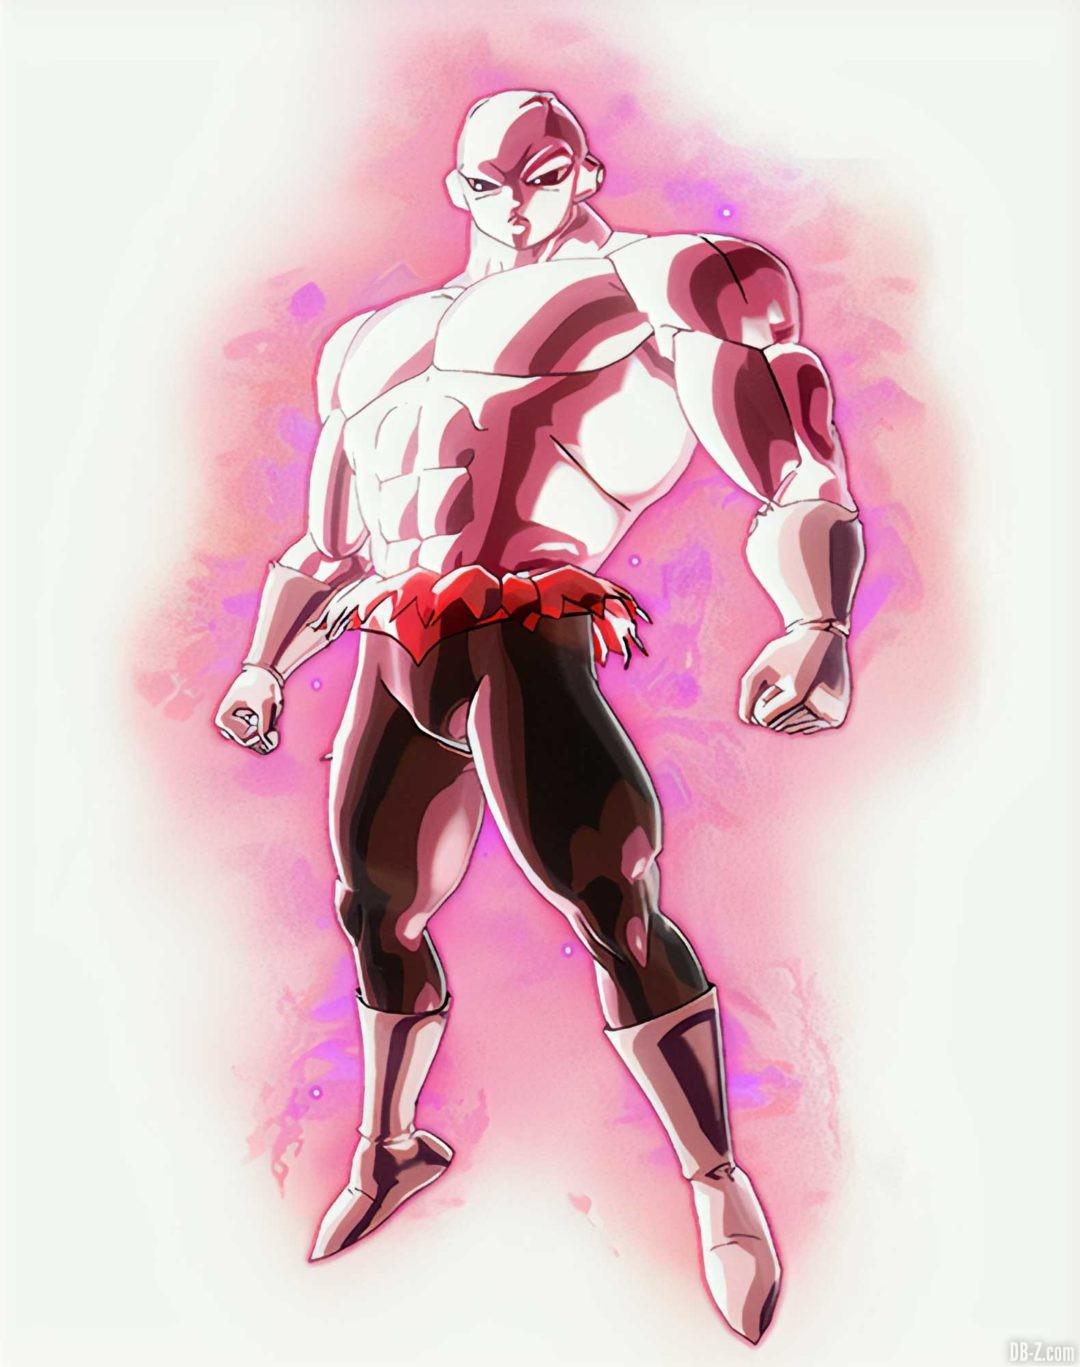 Jiren-Full-Power-Dragon-Ball-Xenoverse-2